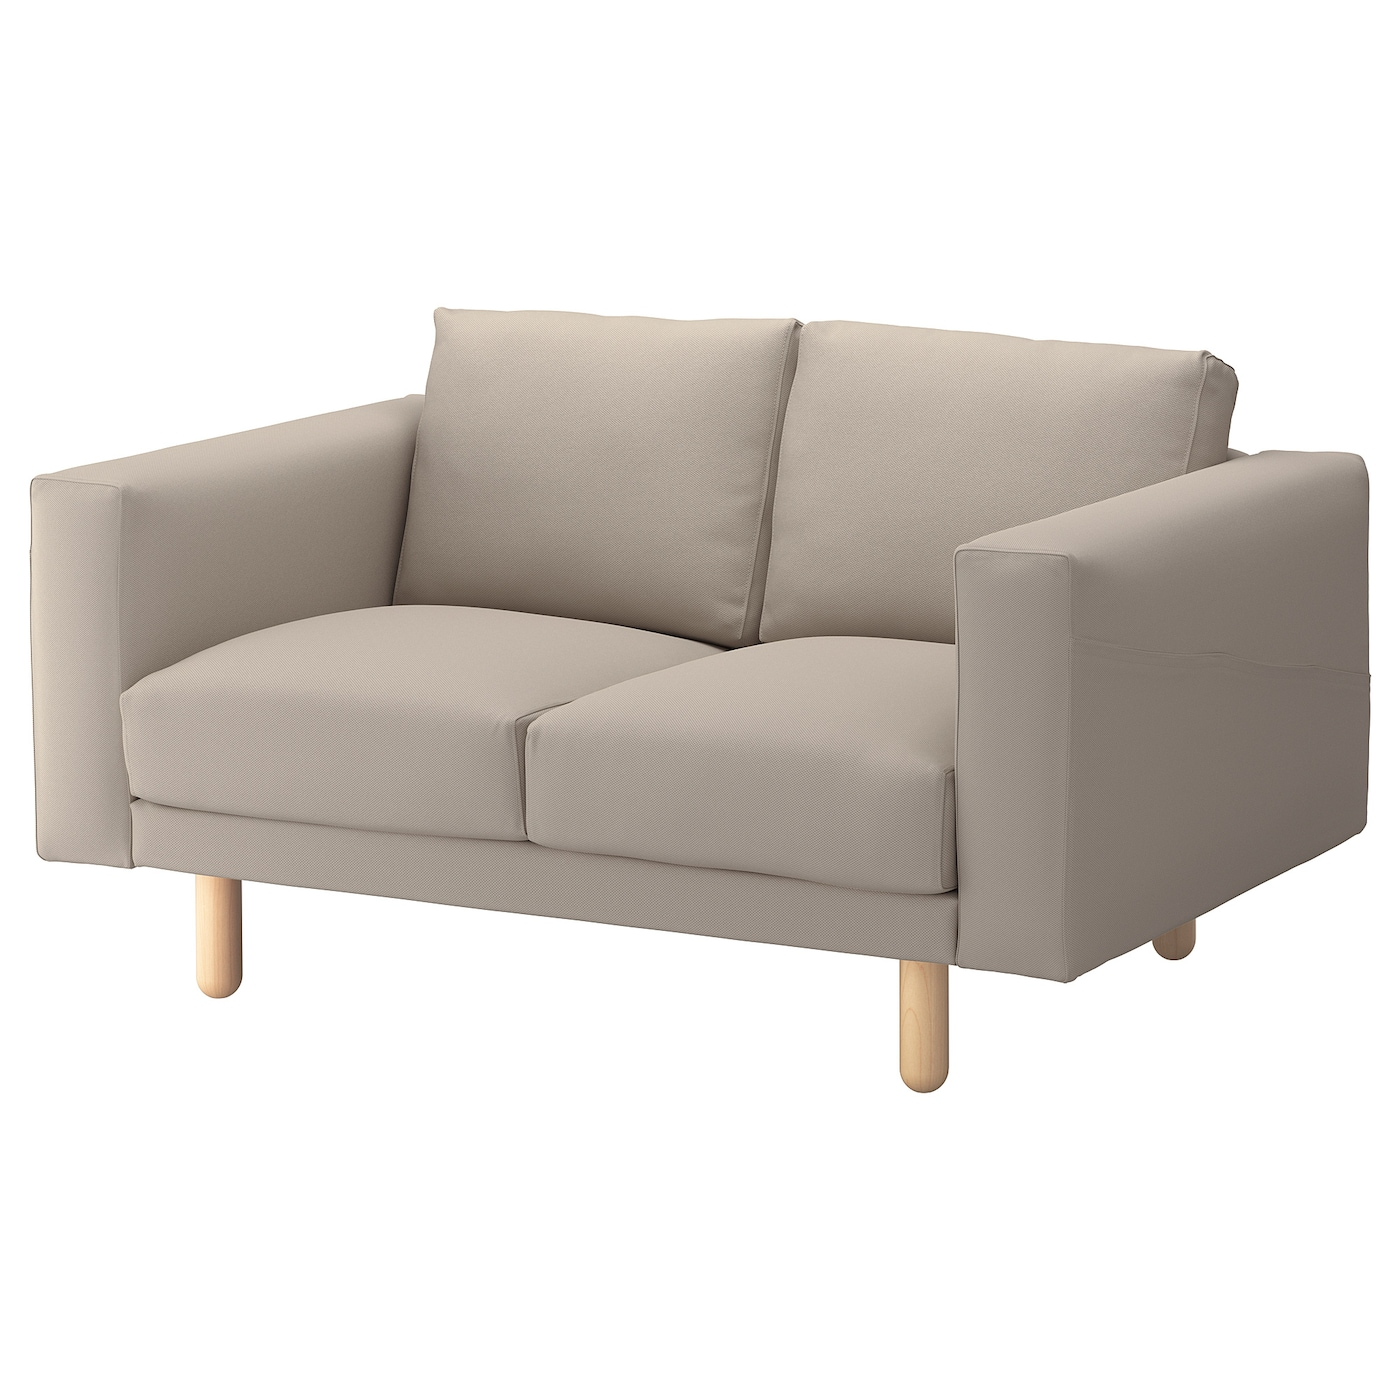 norsborg cover for 2 seat sofa gr sbo beige ikea. Black Bedroom Furniture Sets. Home Design Ideas